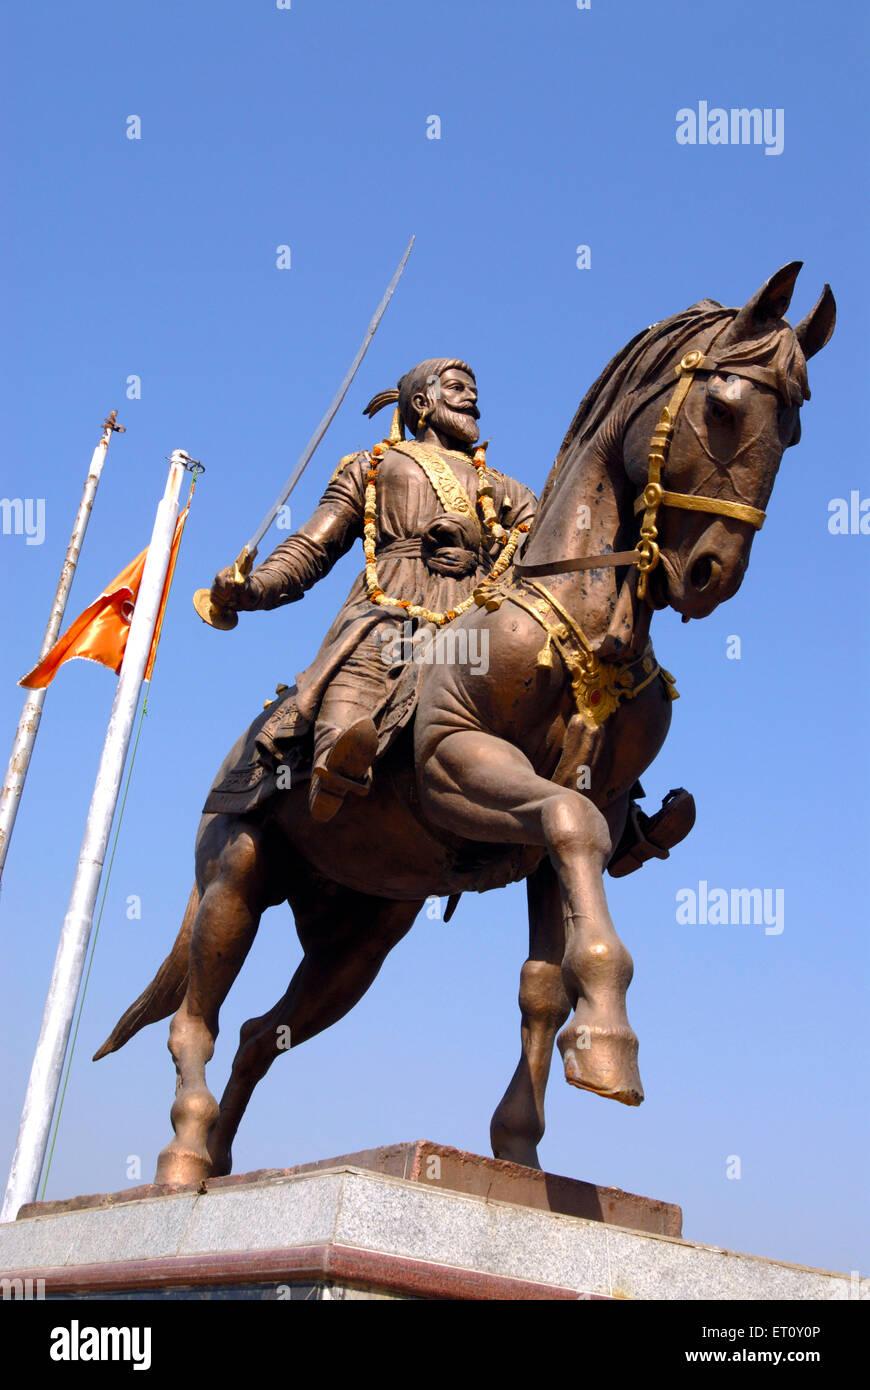 Equestrian bronze statue of Maratha King Shivaji Maharaj at Masunda lake or Talao Pali ; Thane ; Maharashtra ; India - Stock Image